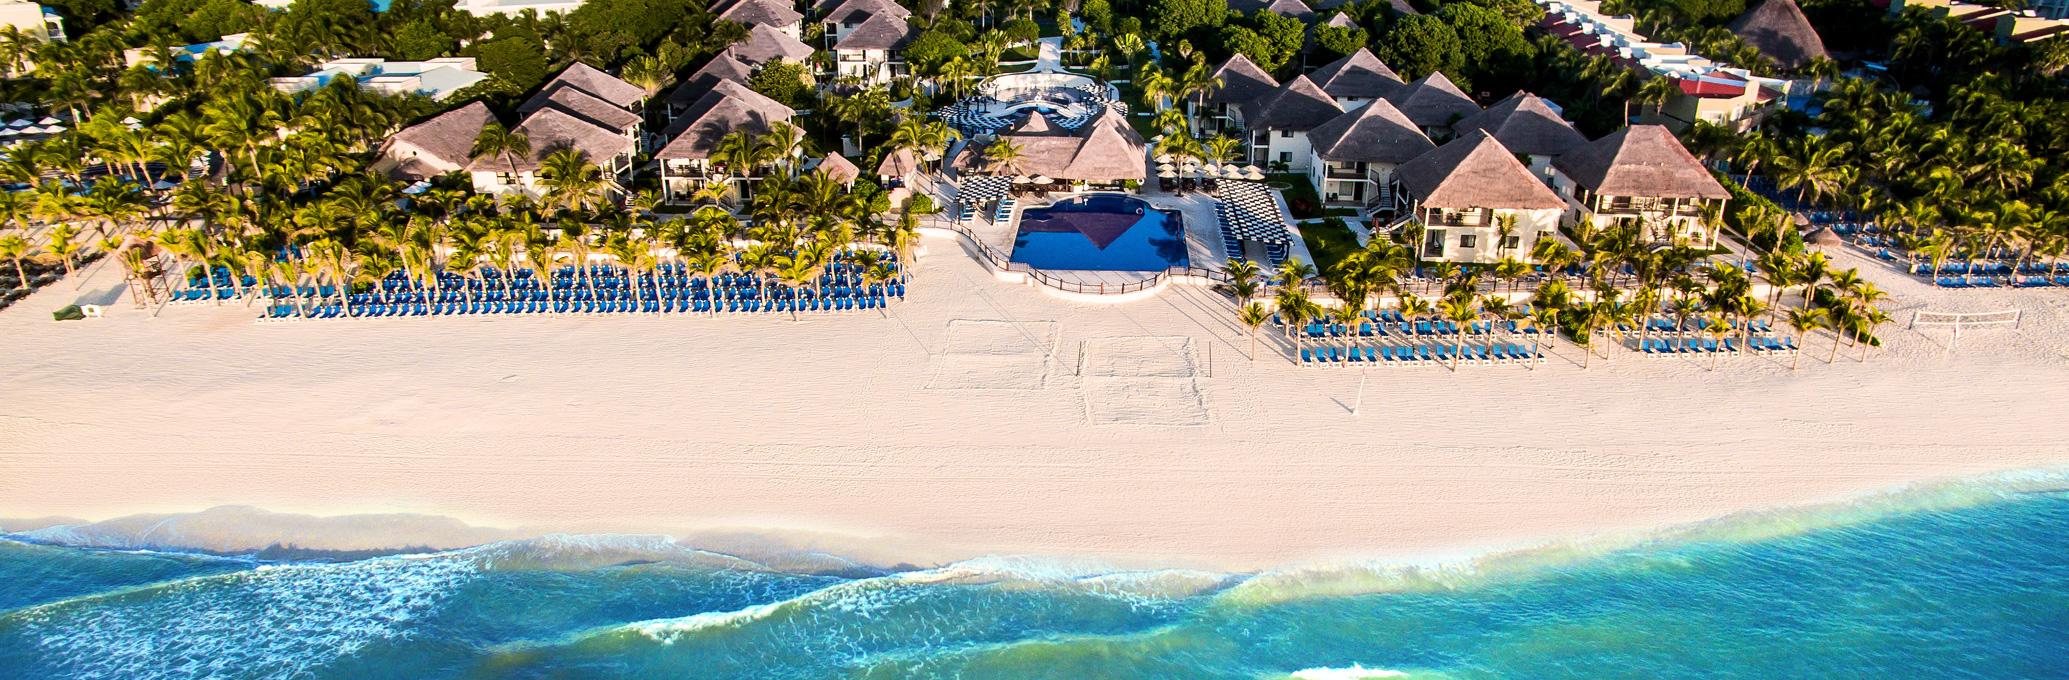 Allegro Playacar: hotéis em Playa del Carmen